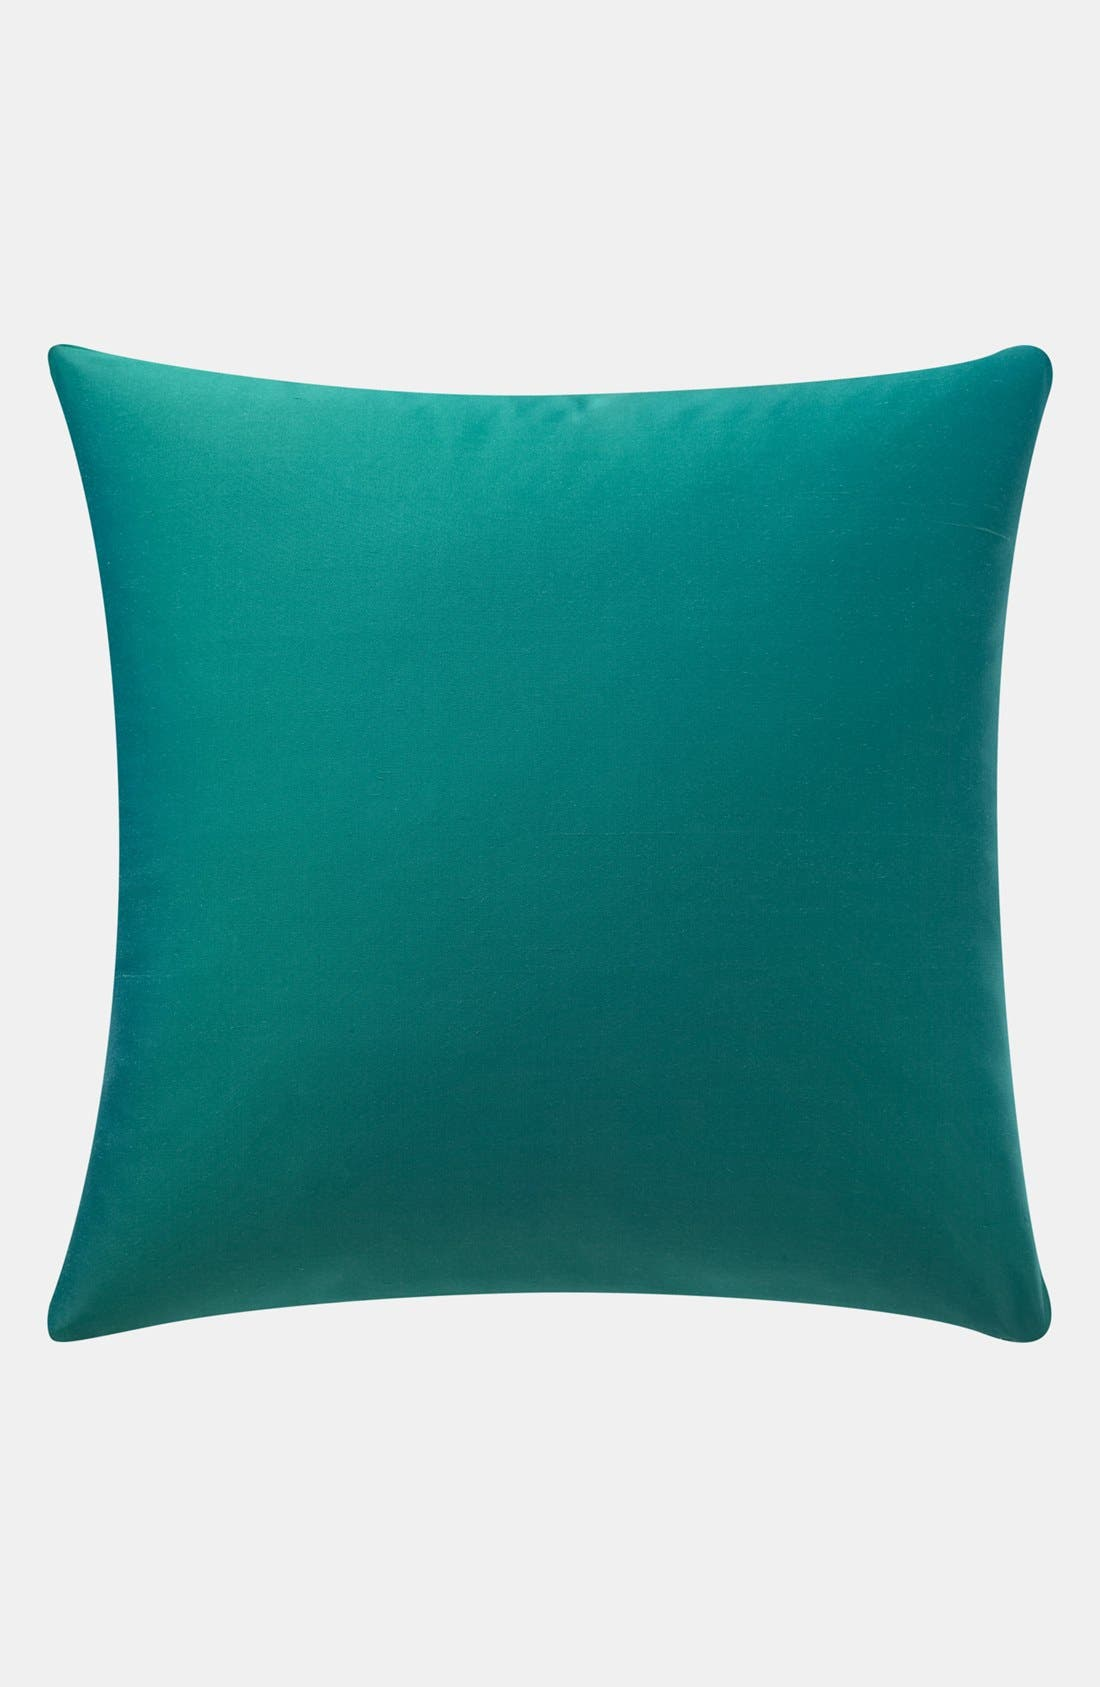 Main Image - KAS Designs 'Samara' Pillow (Online Only)